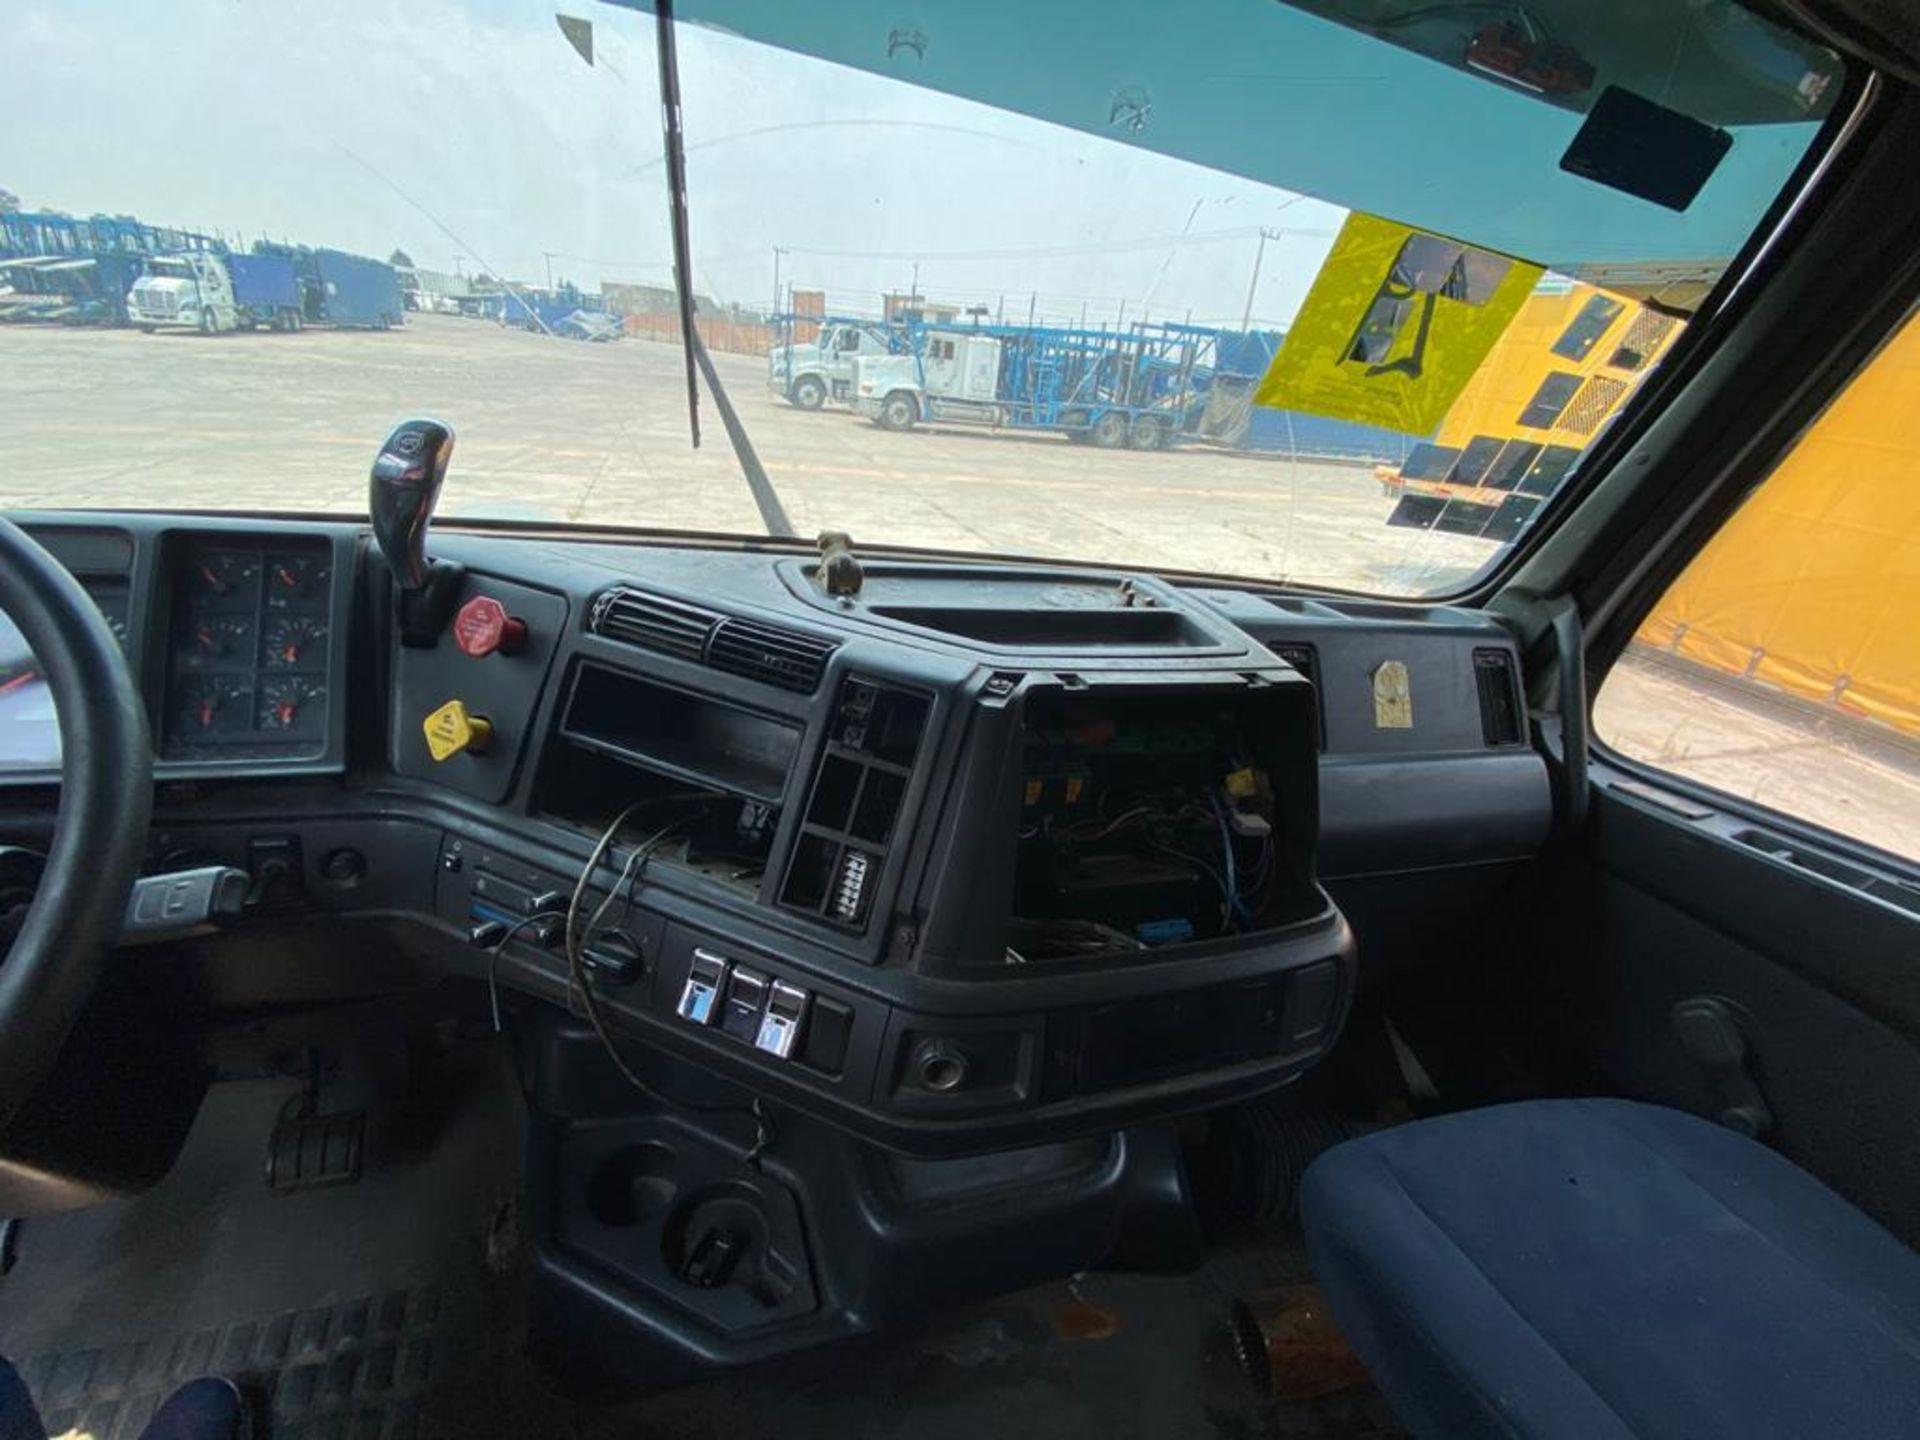 2001 Volvo Sleeper Truck Tractor, estándar transmissión of 18 speeds, with Volvo motor - Image 48 of 60